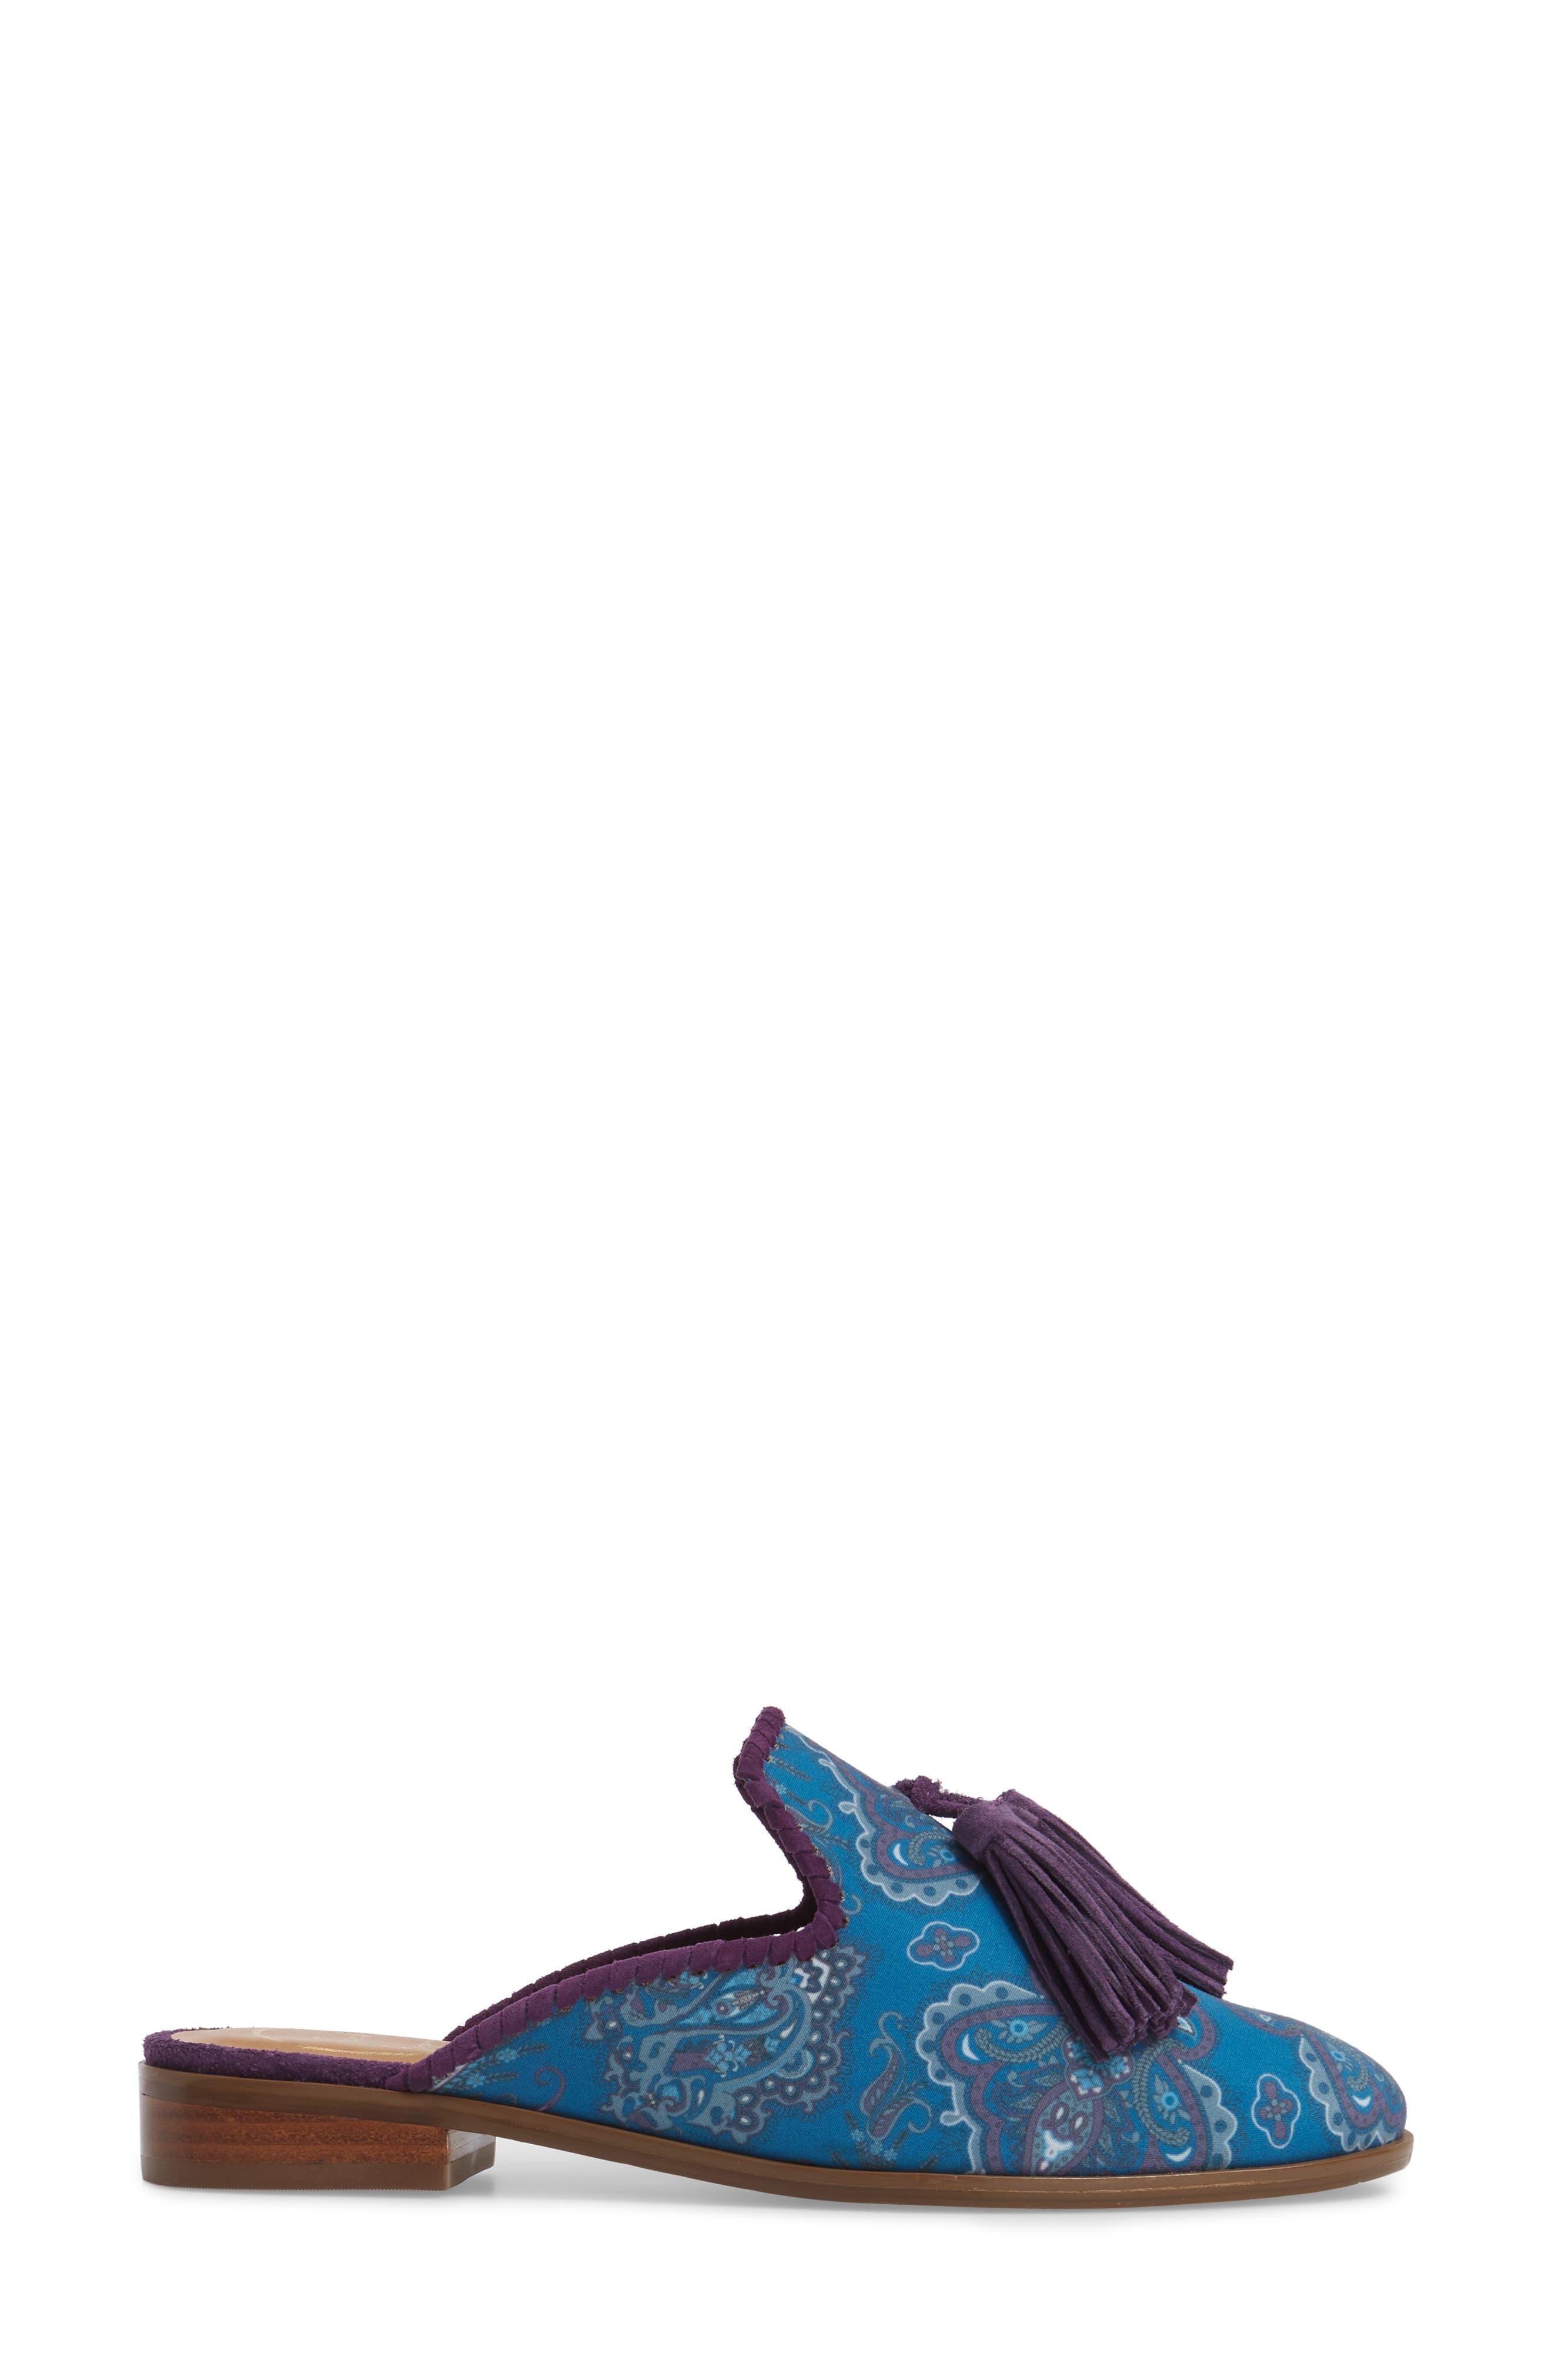 Delaney Tassel Mule,                             Alternate thumbnail 3, color,                             Blue Paisley Fabric